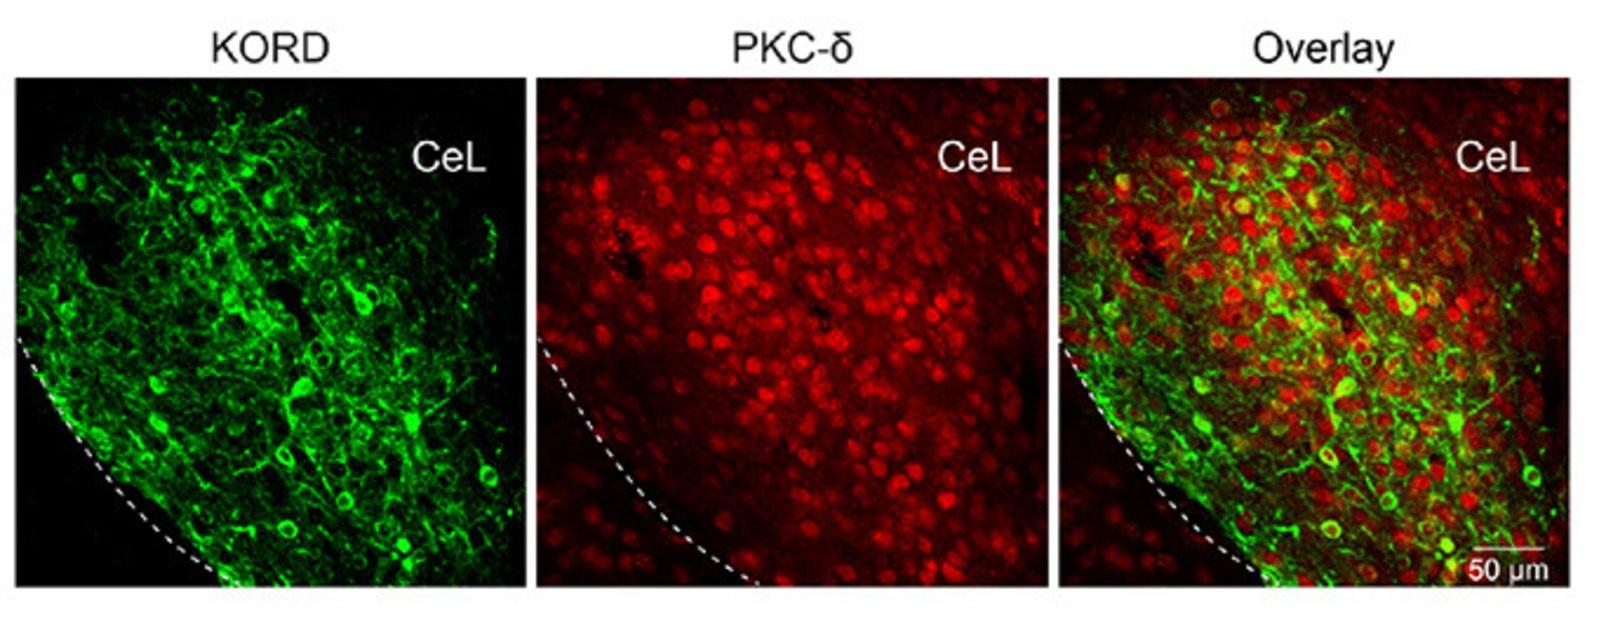 Cold_Spring_Harbor_Laboratory_PKC_cells.jpg